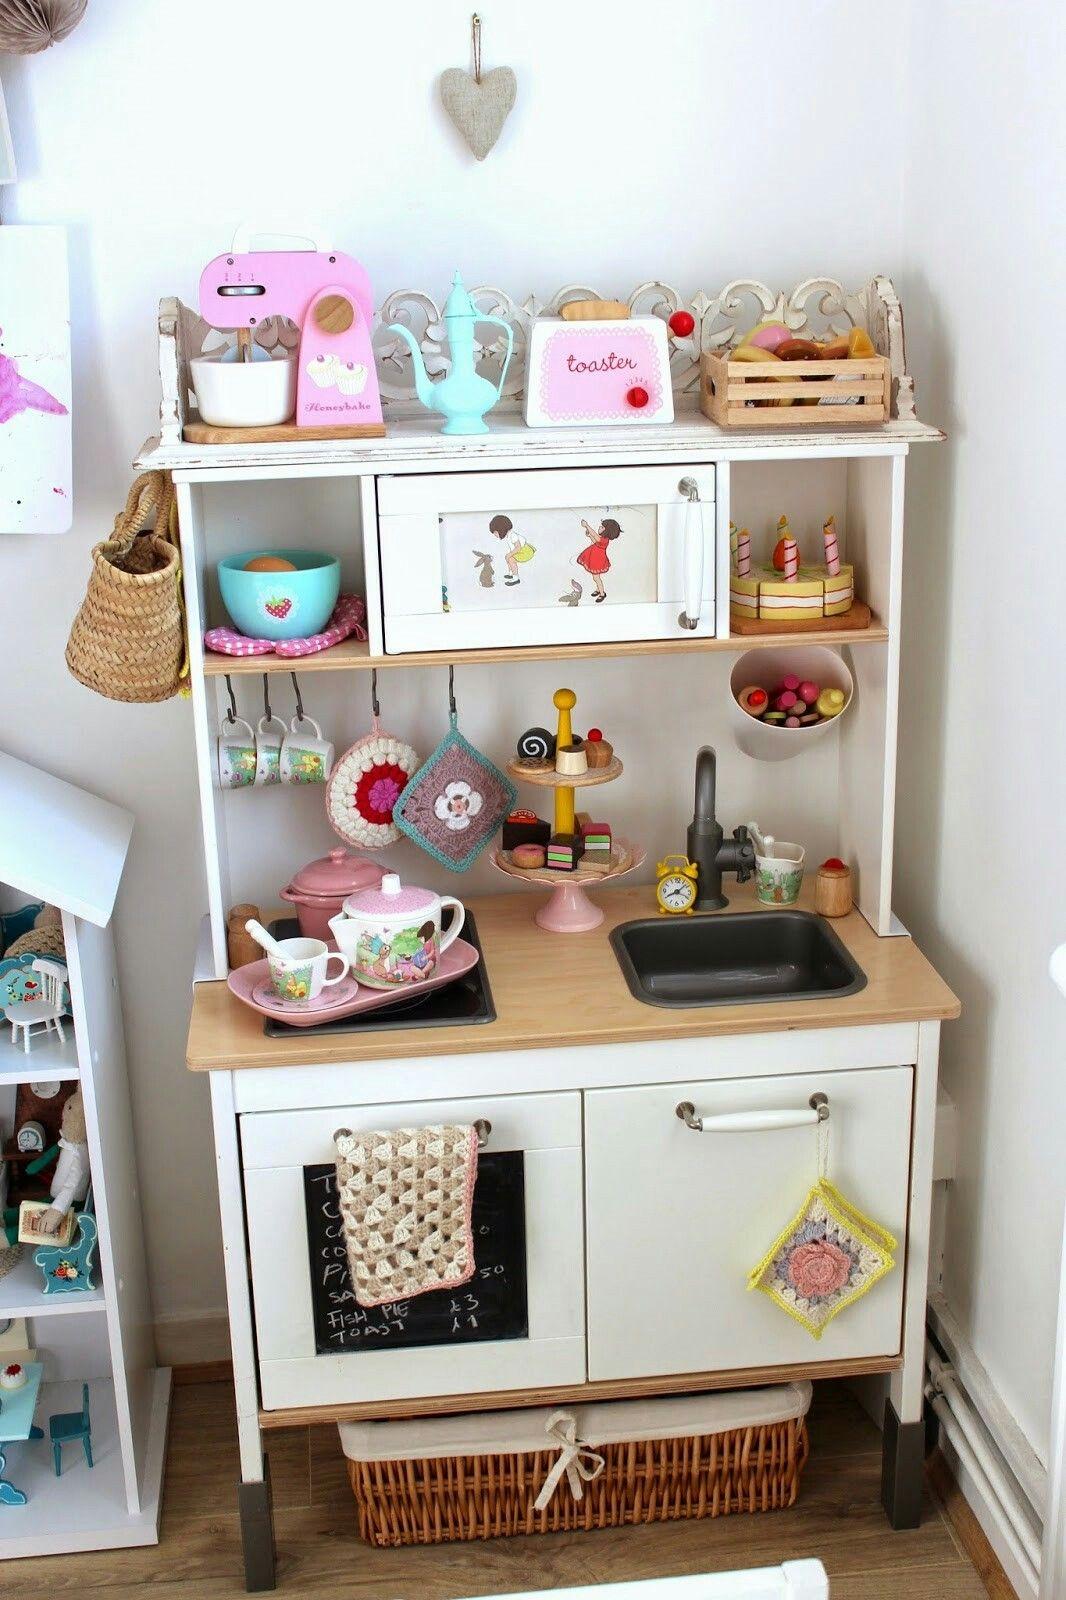 Bubblegarm esra\'splay kitchen   play kitchen   Pinterest ...